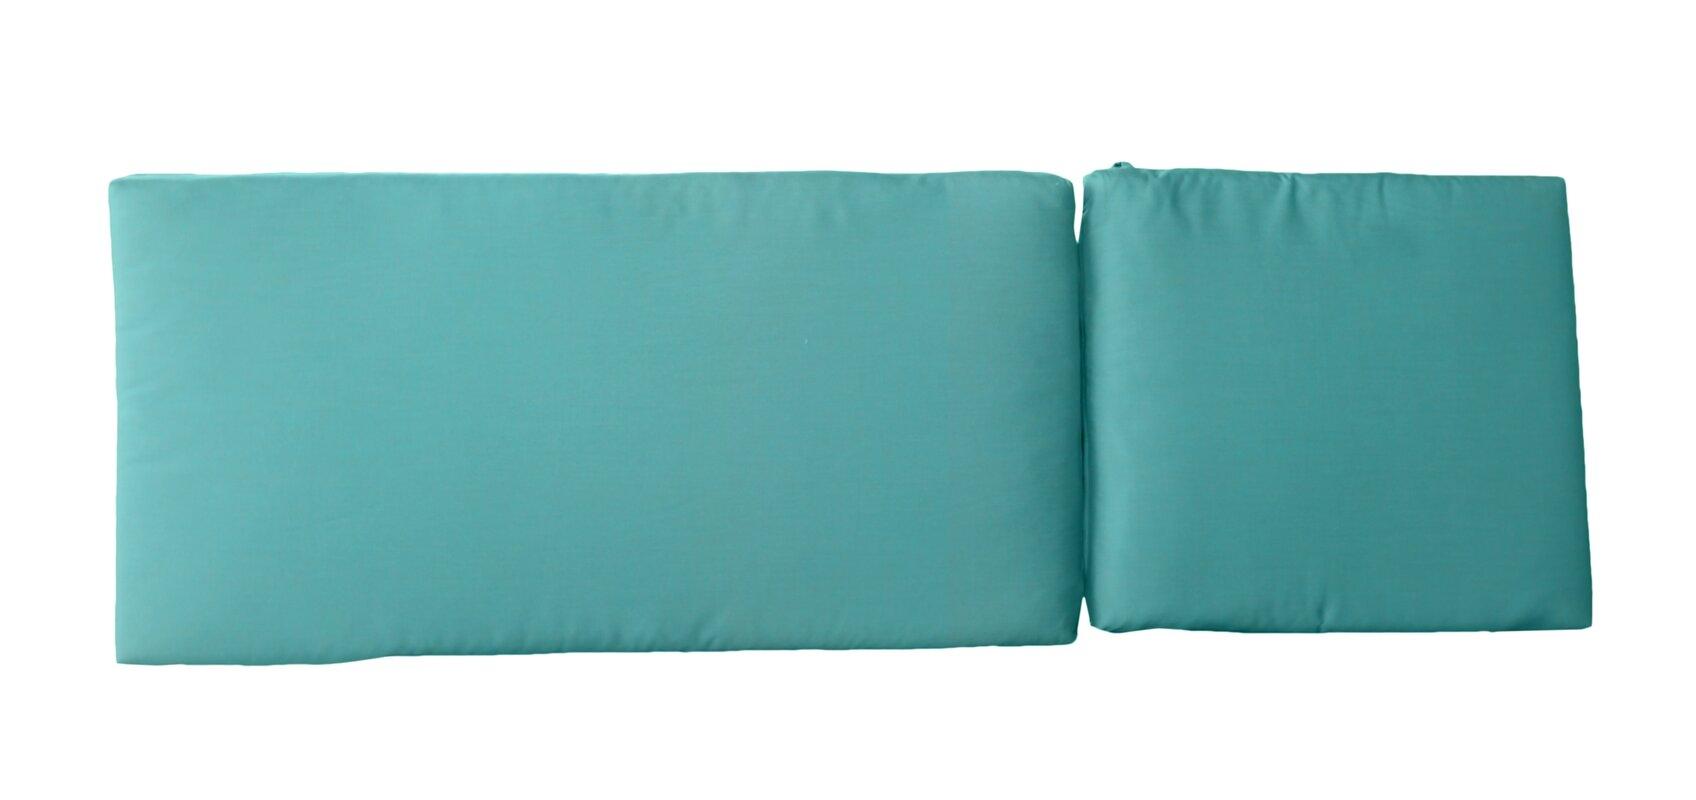 Bellini Outdoor Sunbrella Chaise Lounge Cushion & Reviews